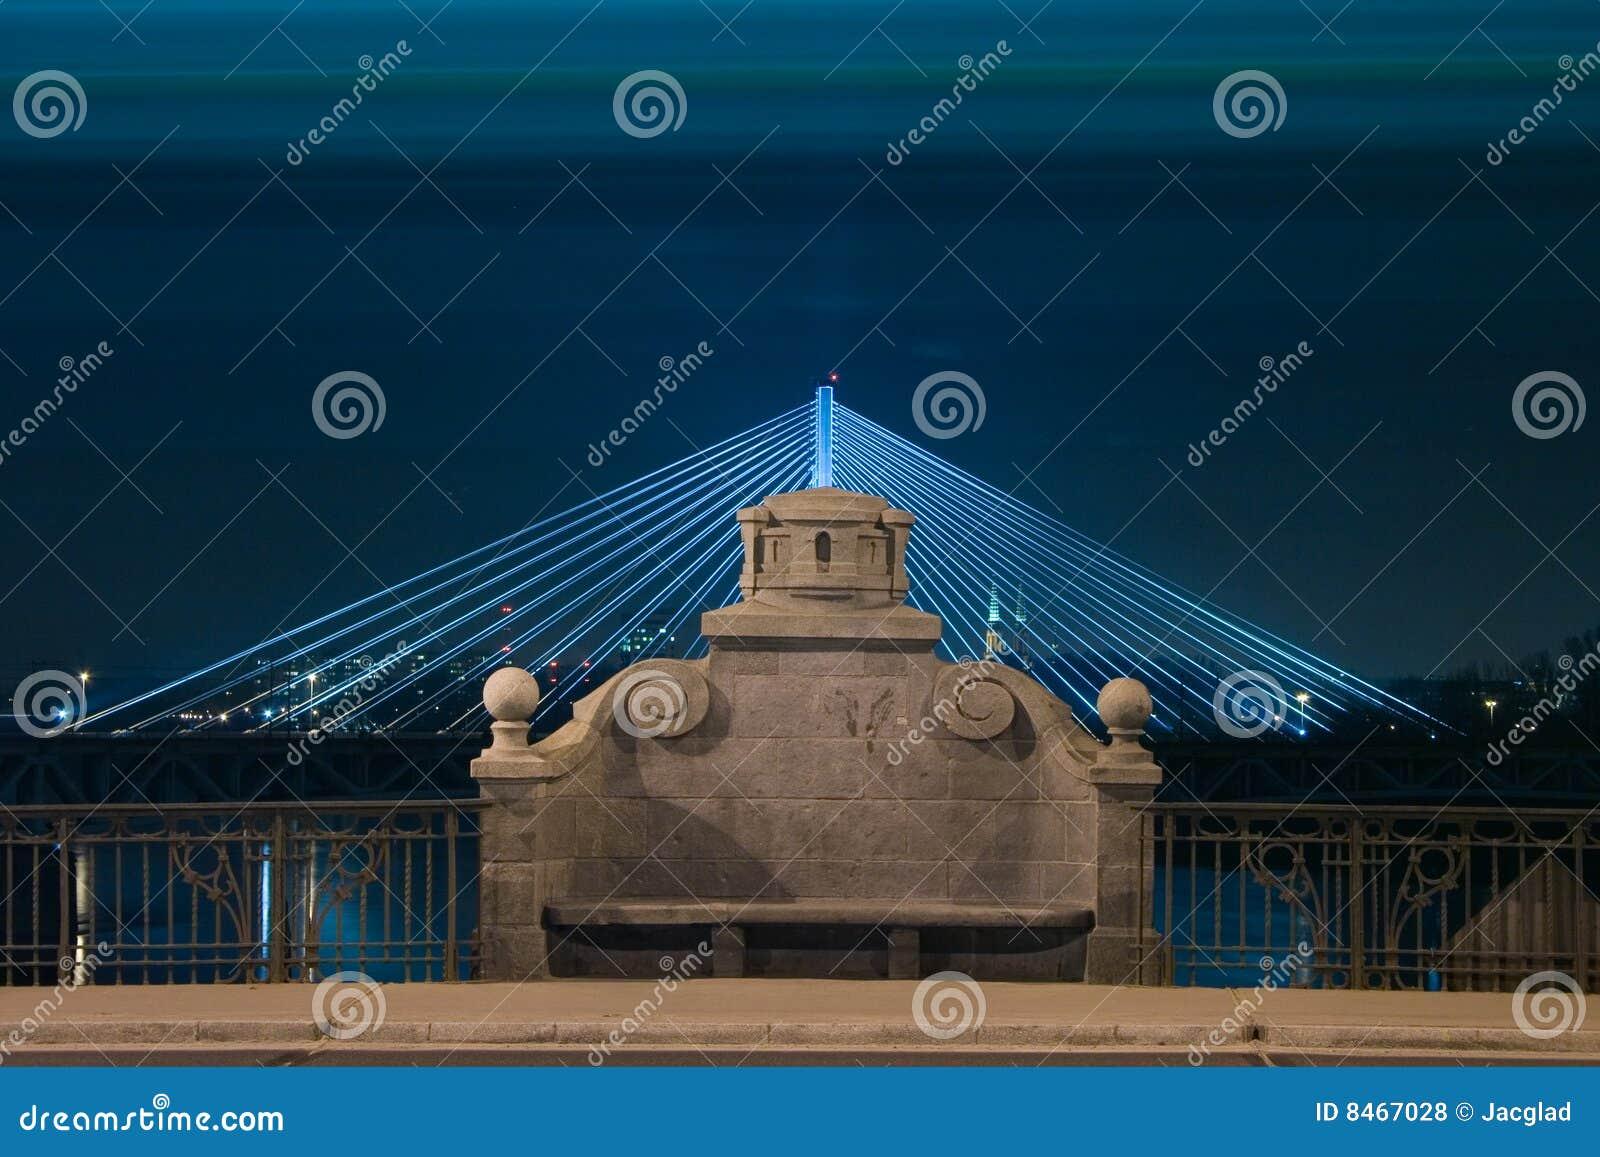 Bänkbron exponerade nattstenen